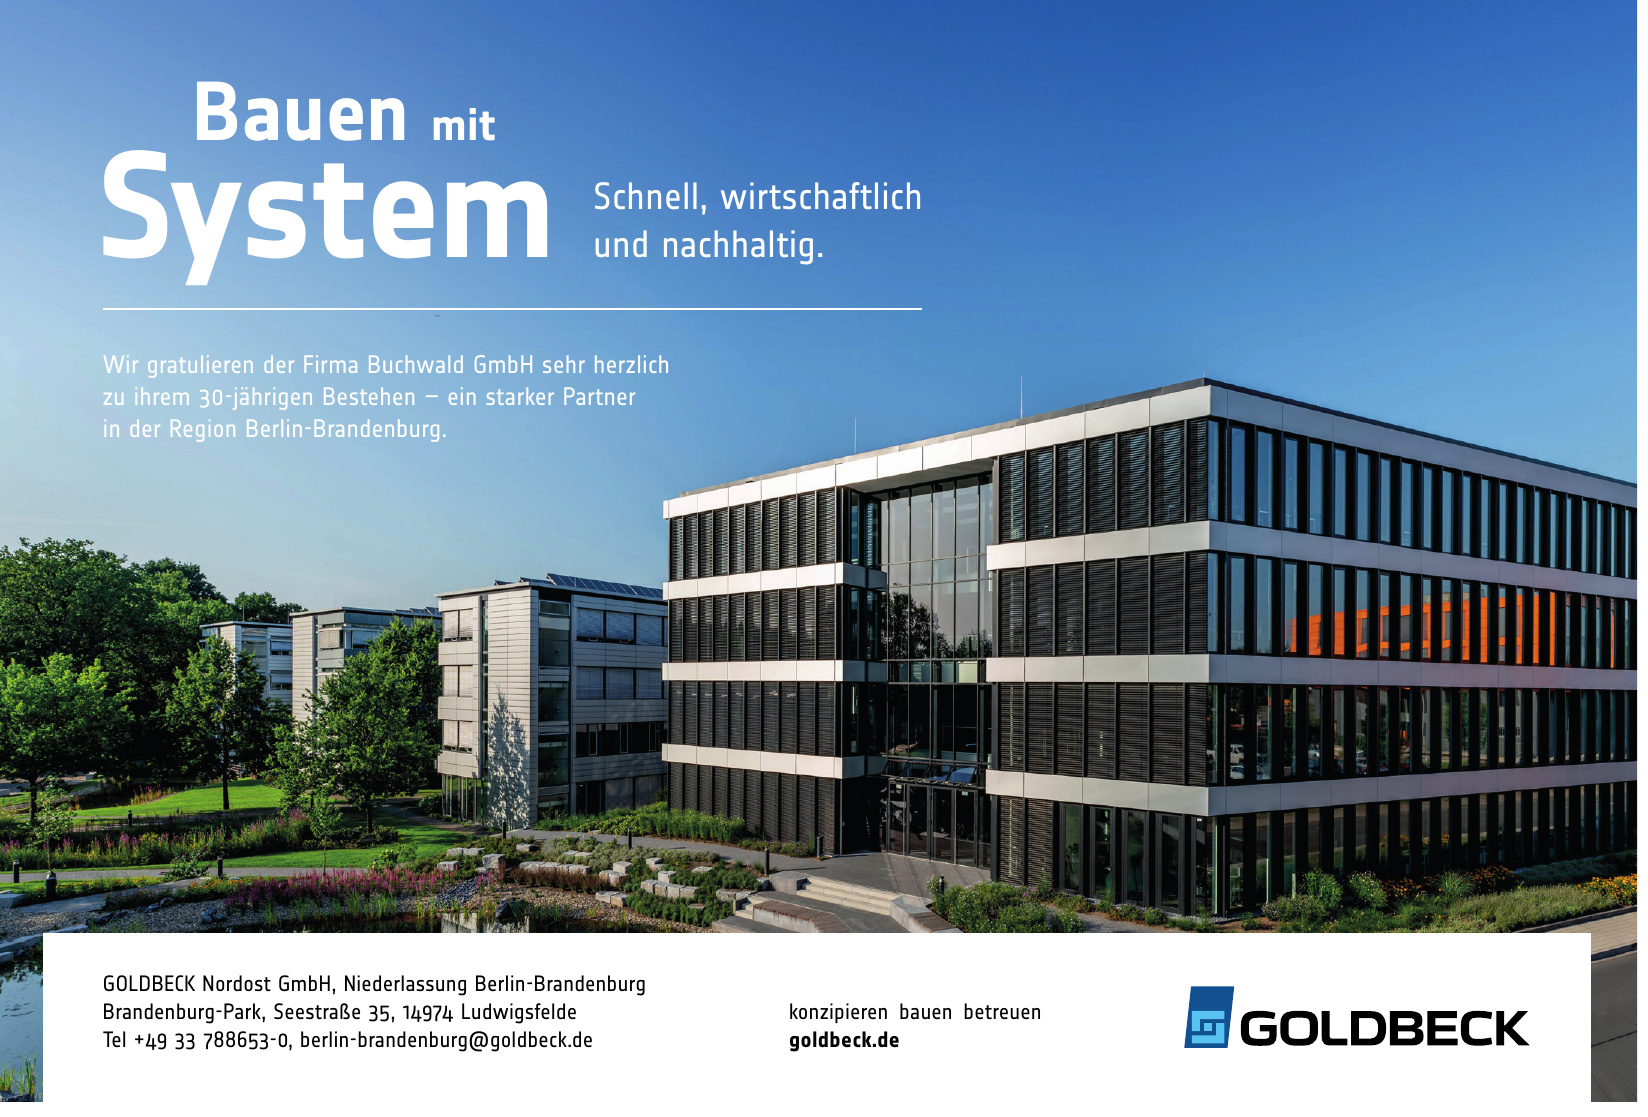 GOLDBECK Nordost GmbH